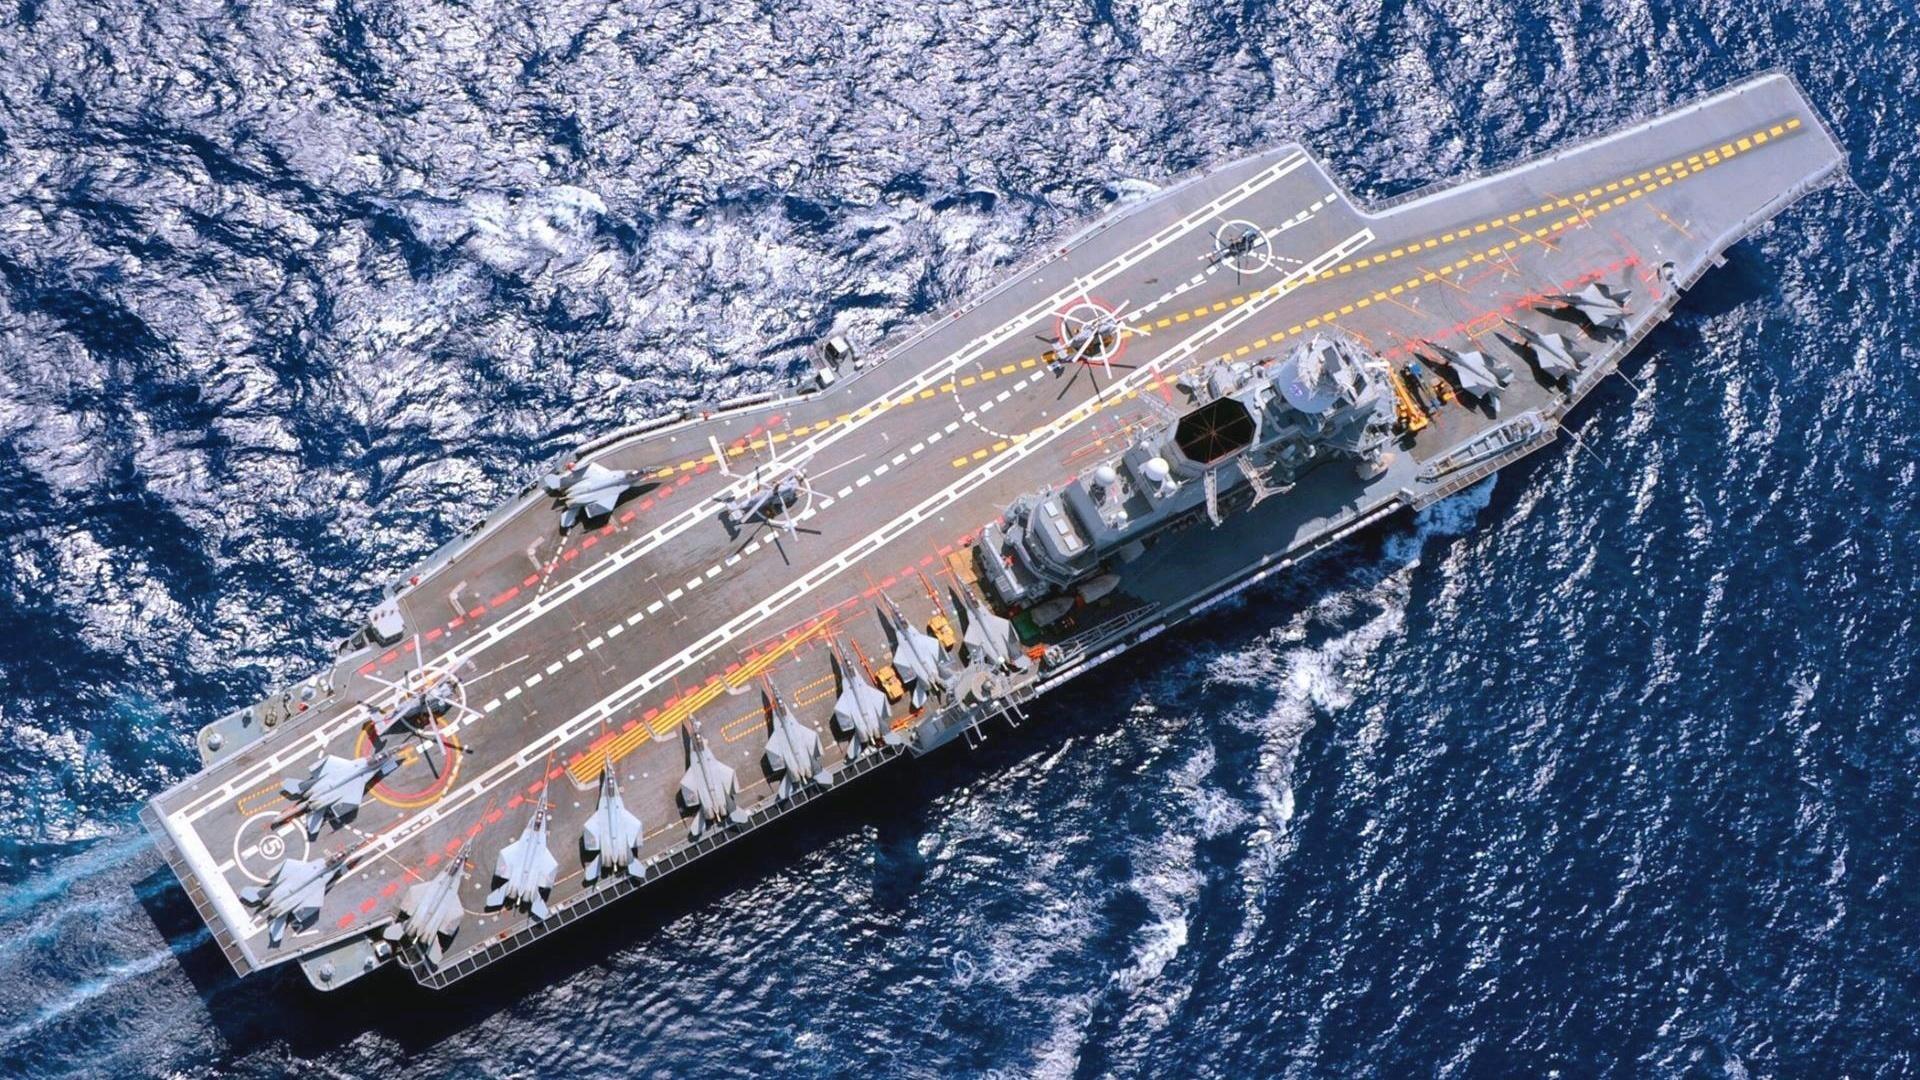 indias second aircraft carrier - HD1680×1050